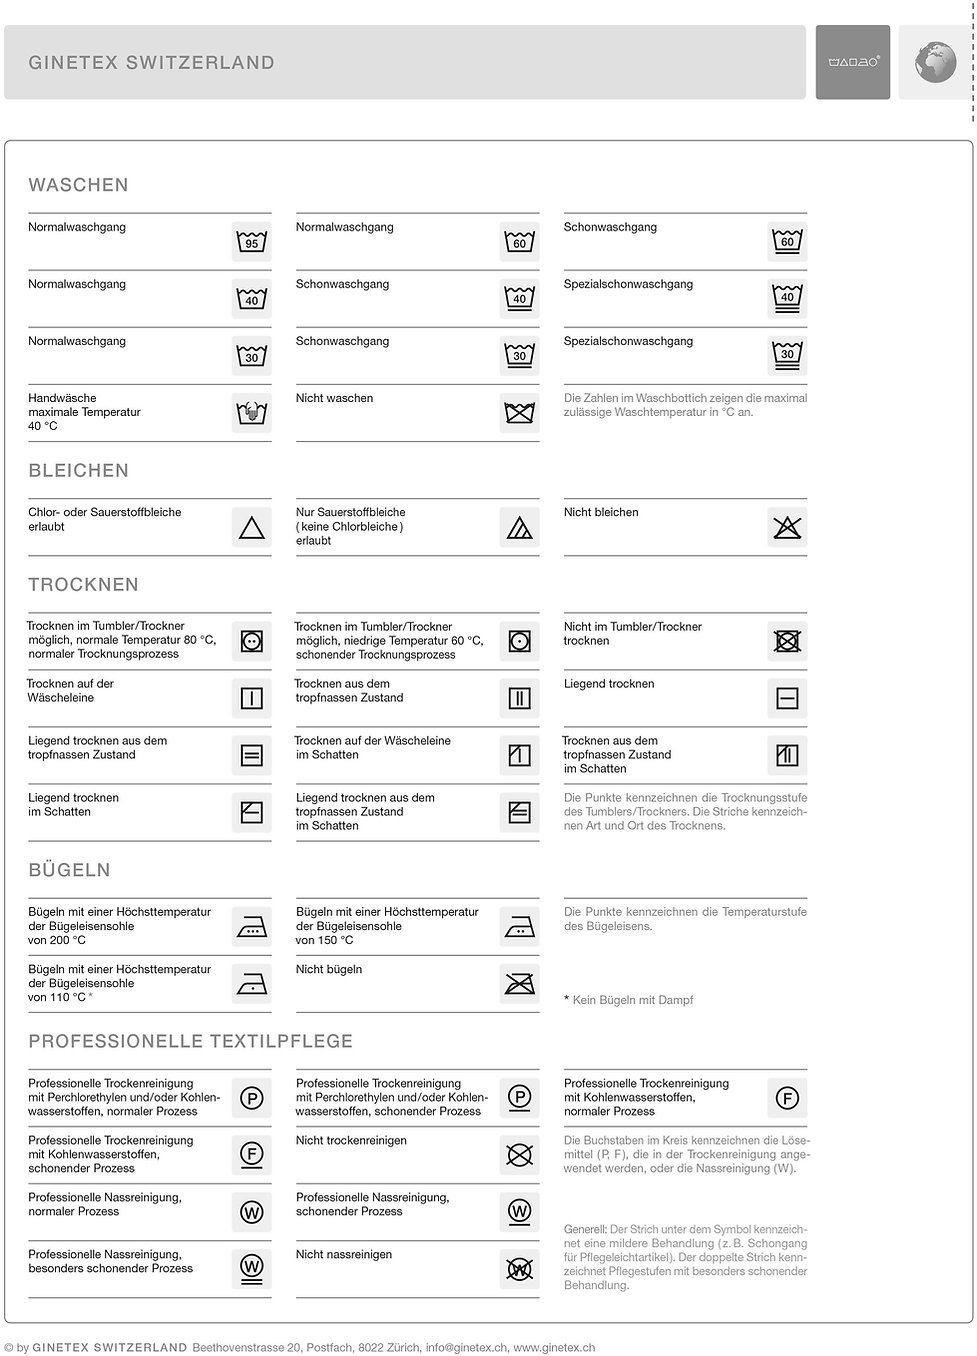 Ginetex symbole.jpg